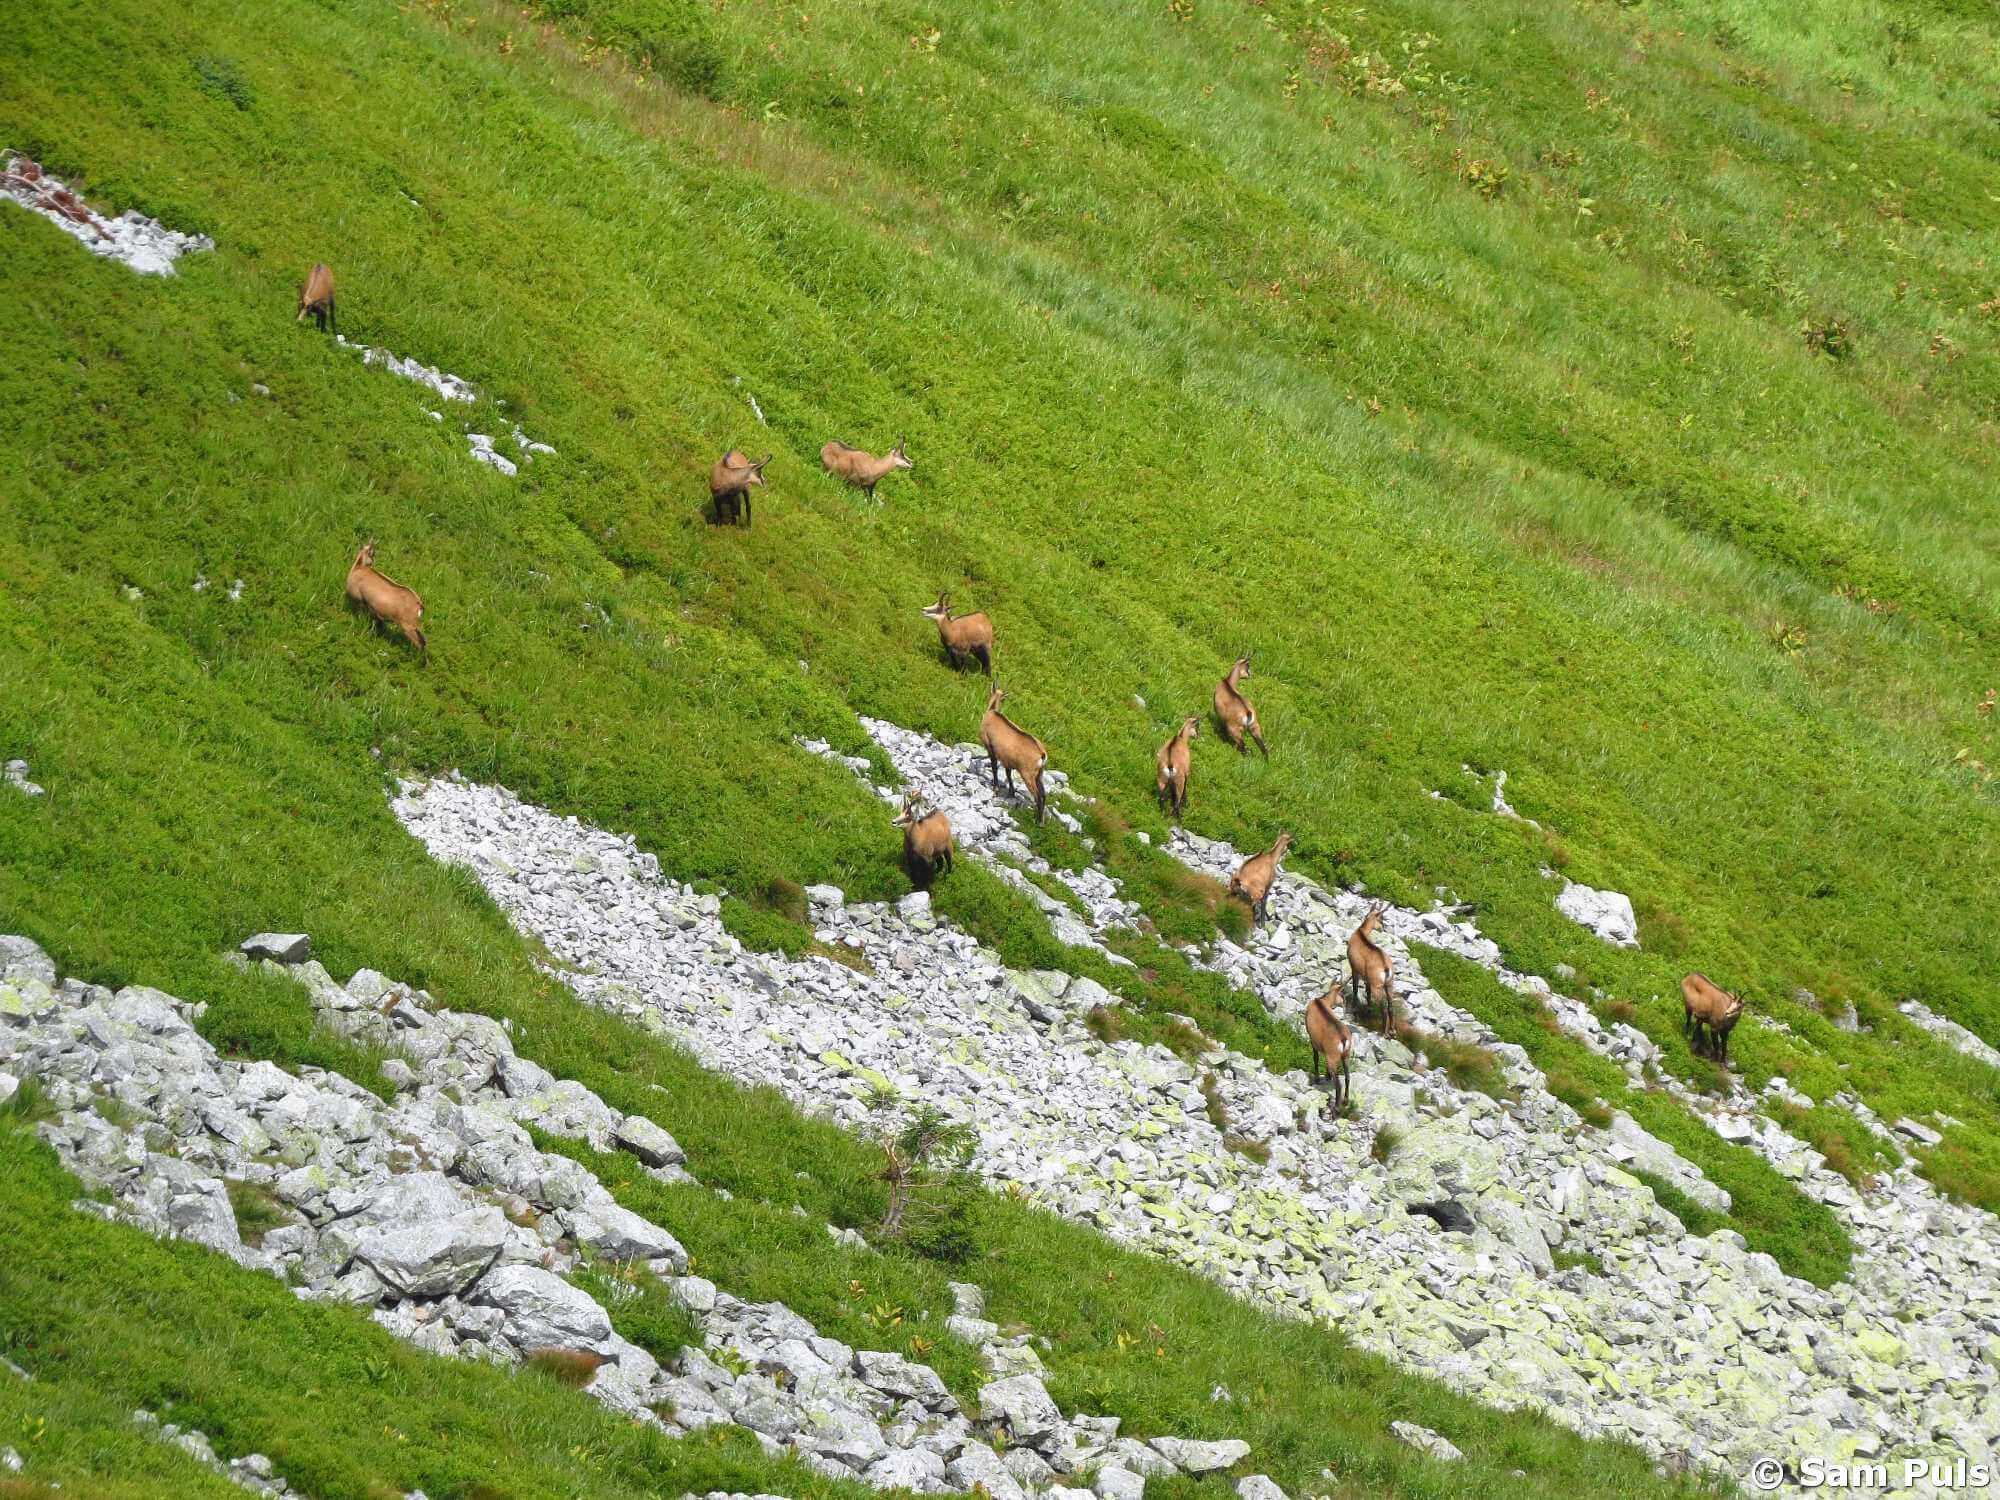 Wildlife watching in the High Tatras